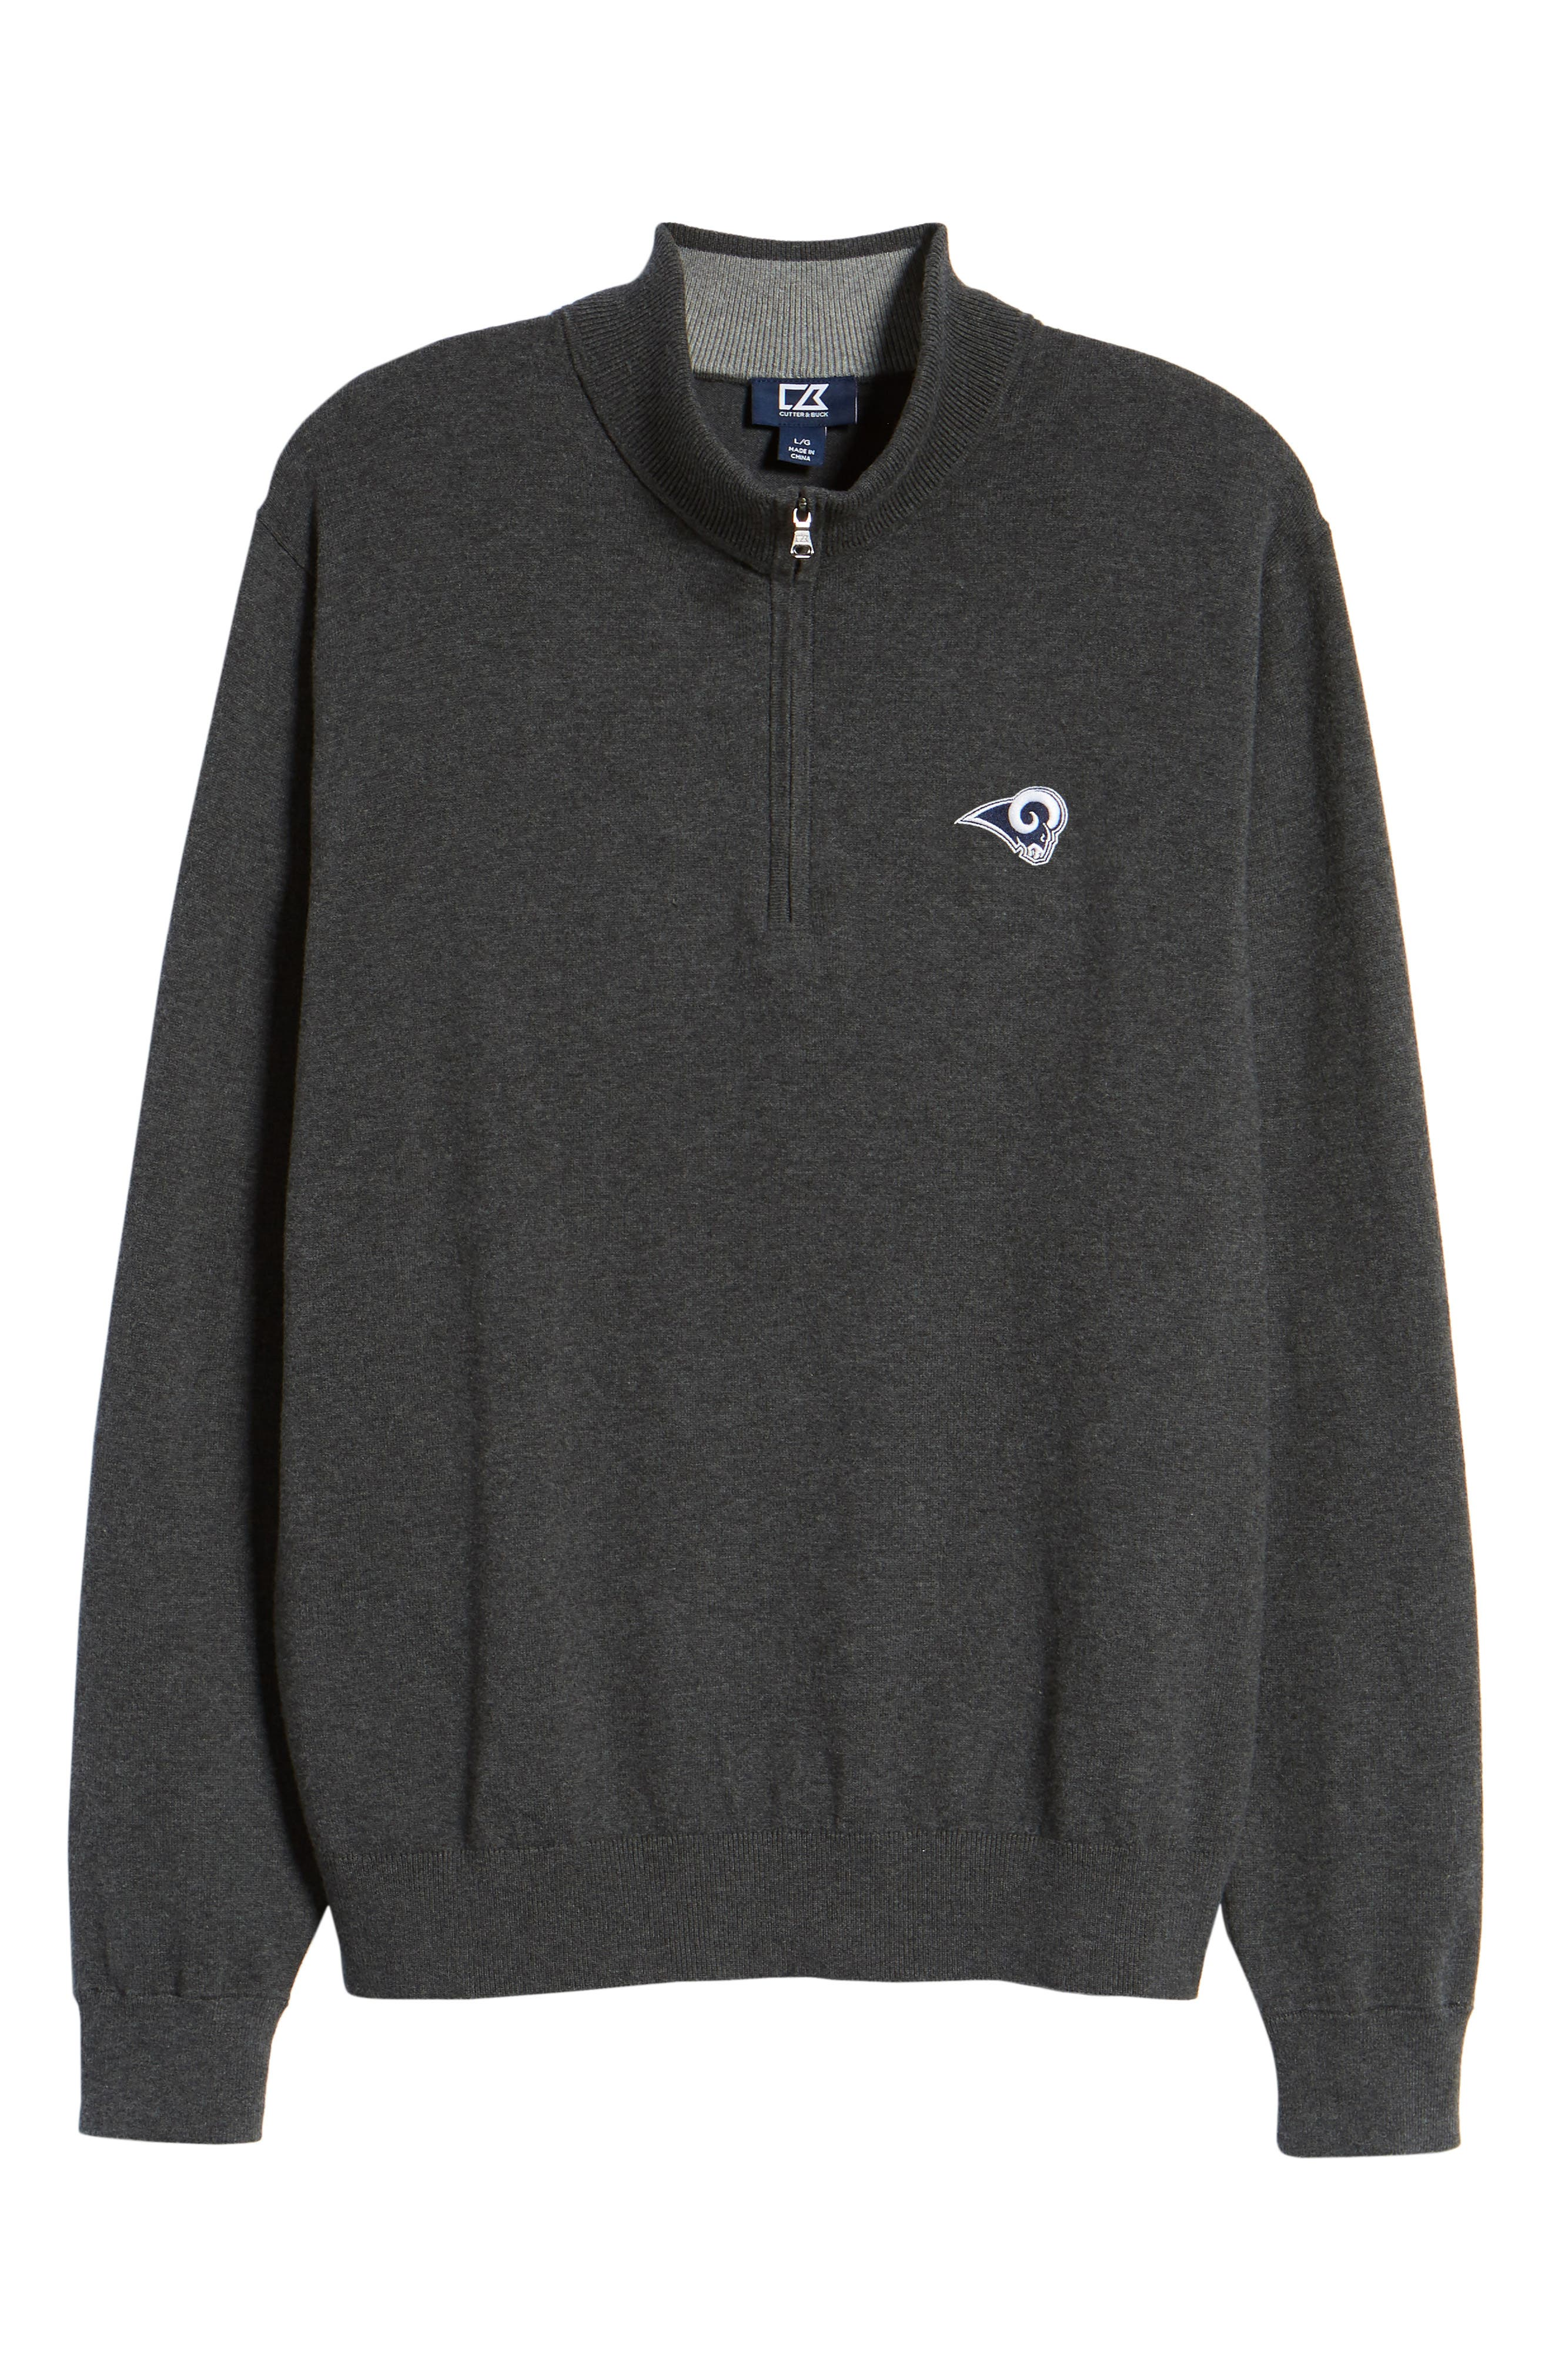 Los Angeles Rams - Lakemont Regular Fit Quarter Zip Sweater,                             Alternate thumbnail 6, color,                             CHARCOAL HEATHER